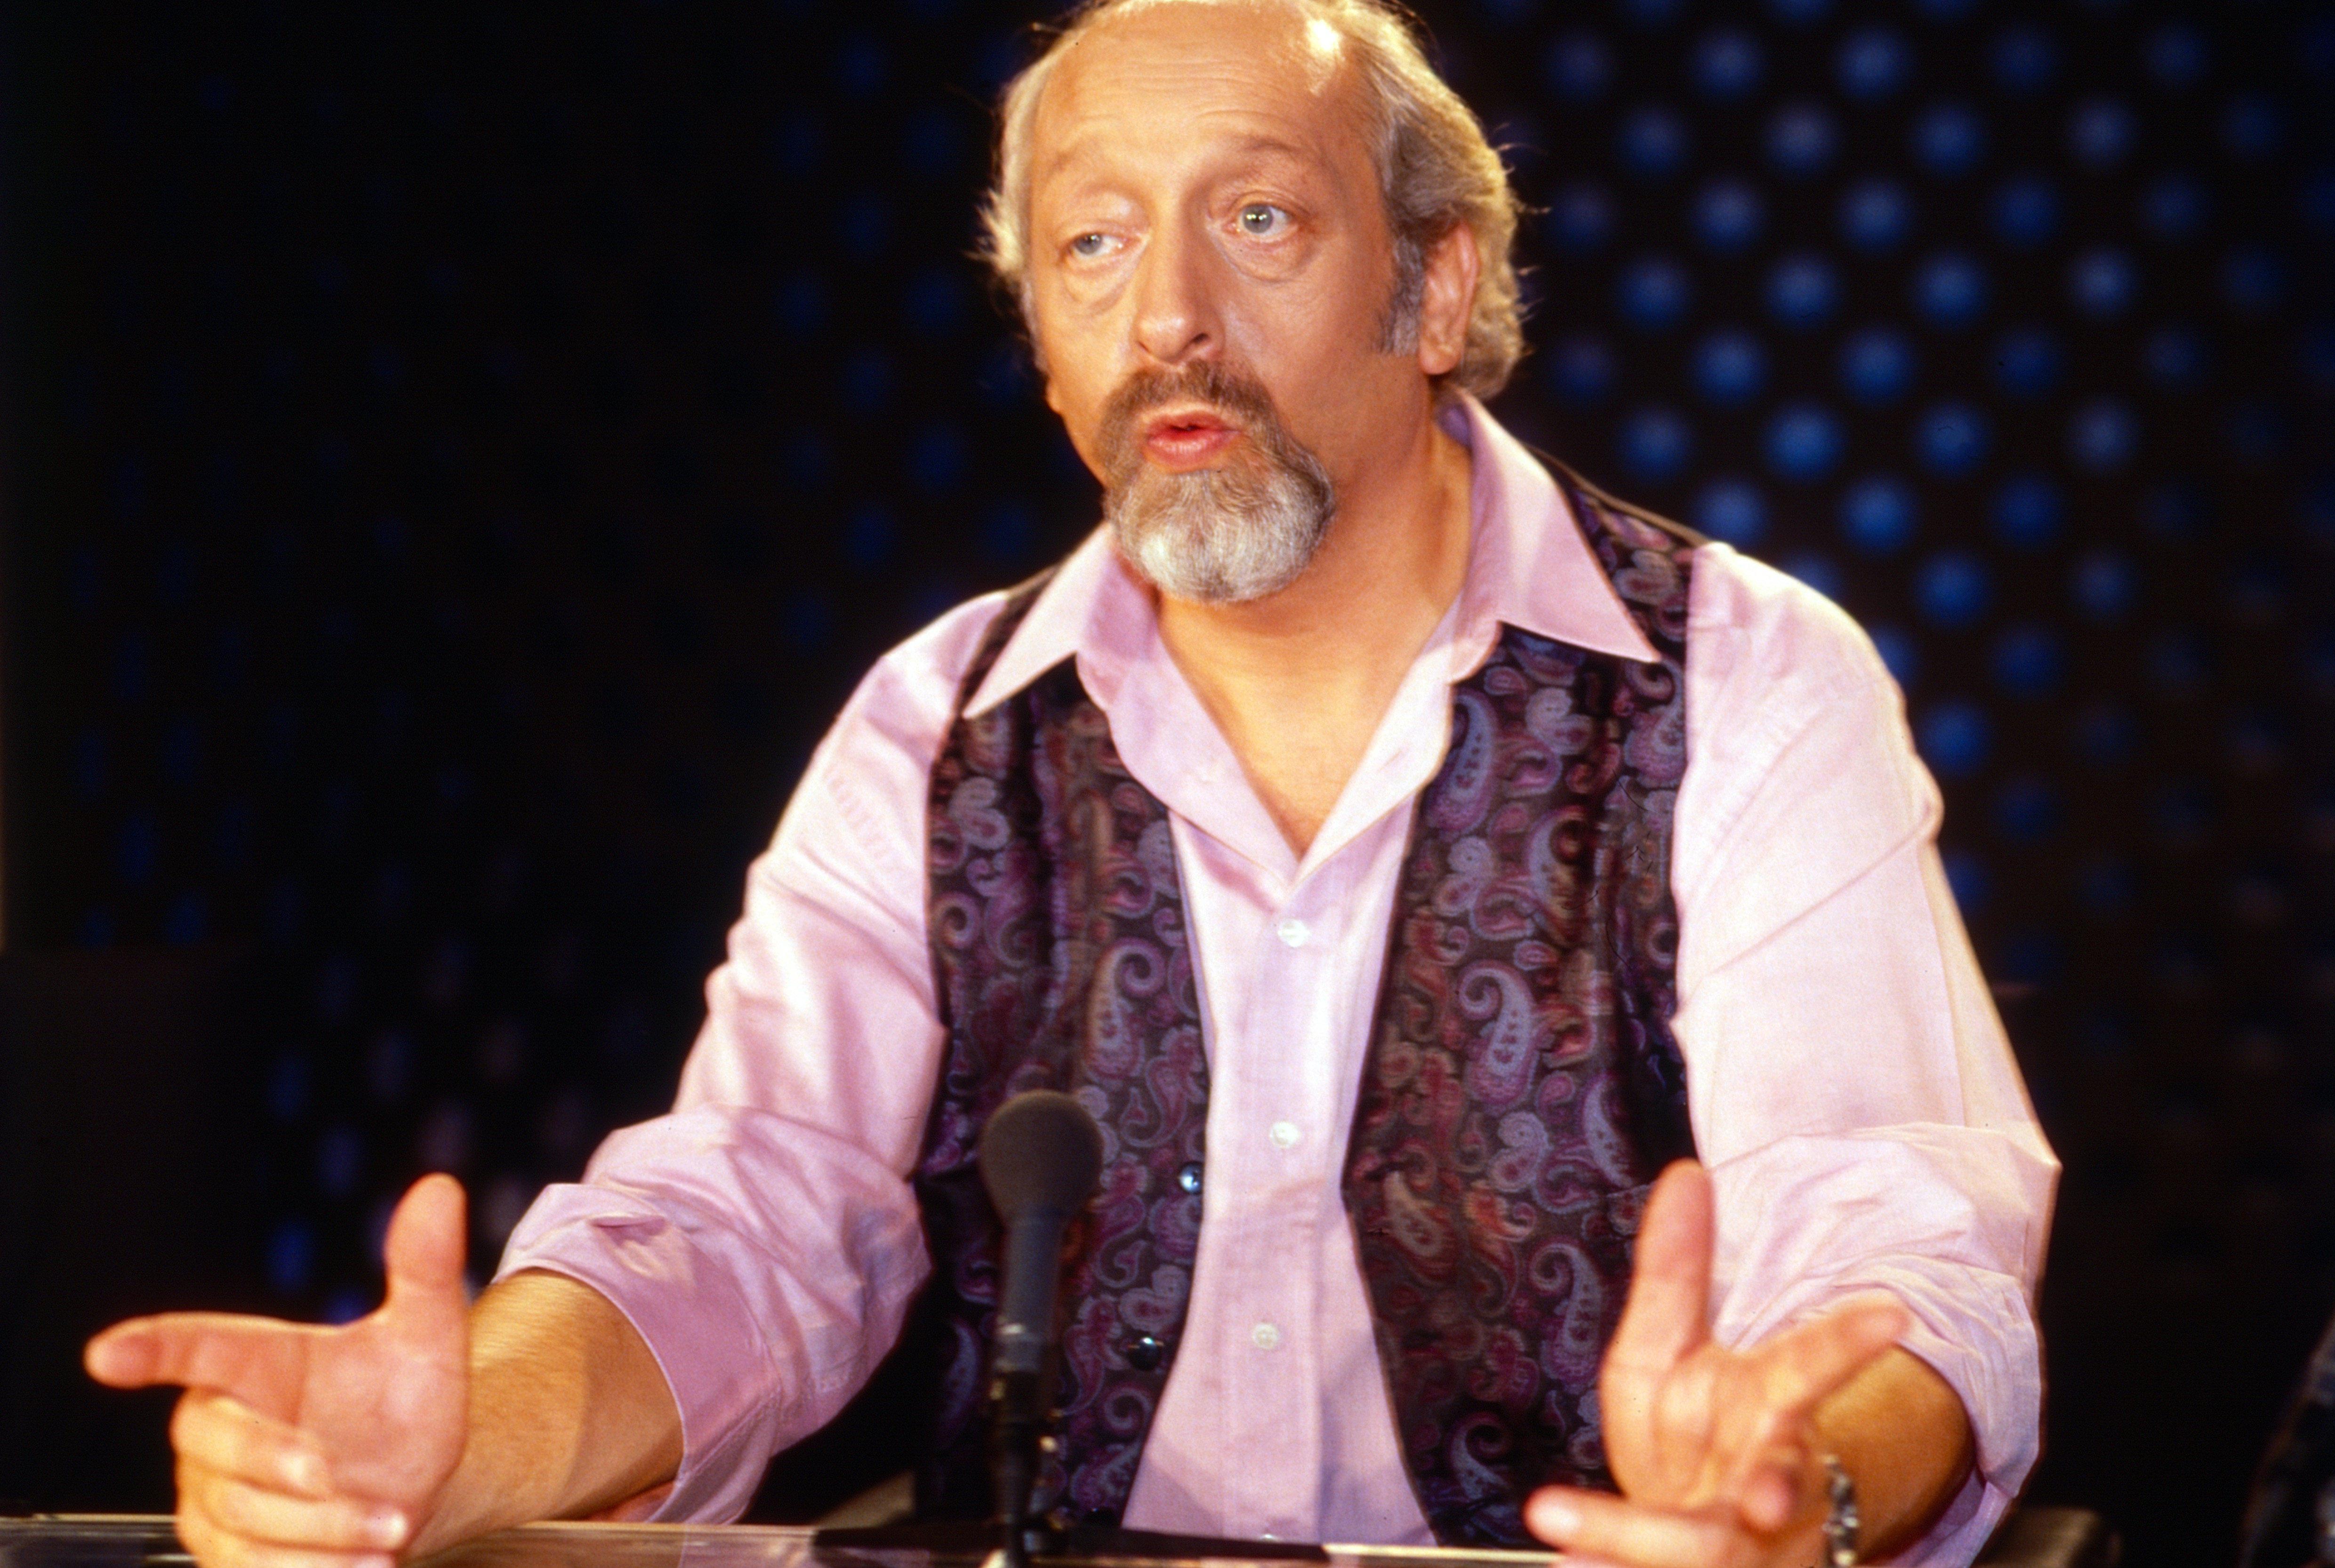 Nach Schlaganfall: Komiker Karl Dall ist tot